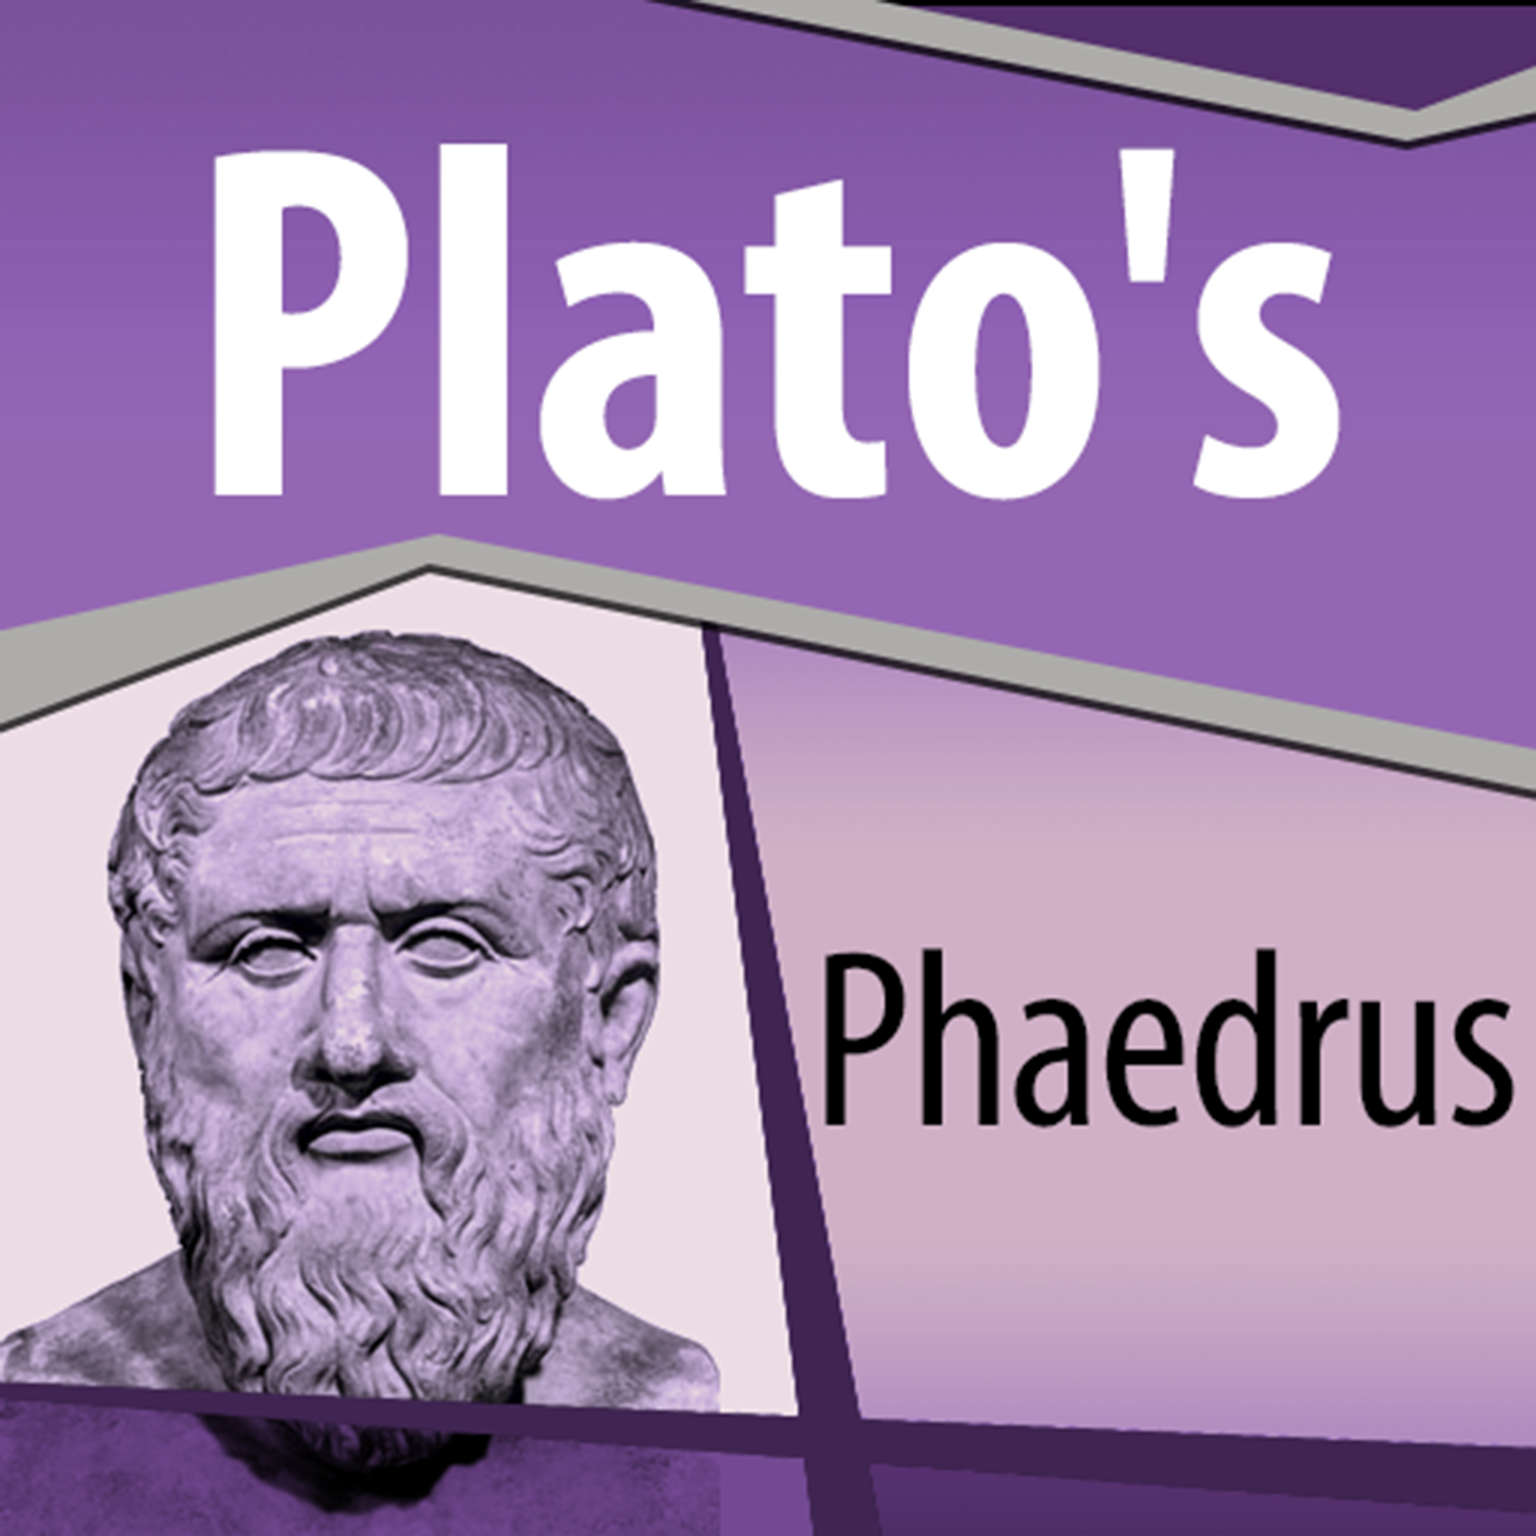 Platos Phaedrus Audiobook, by Plato